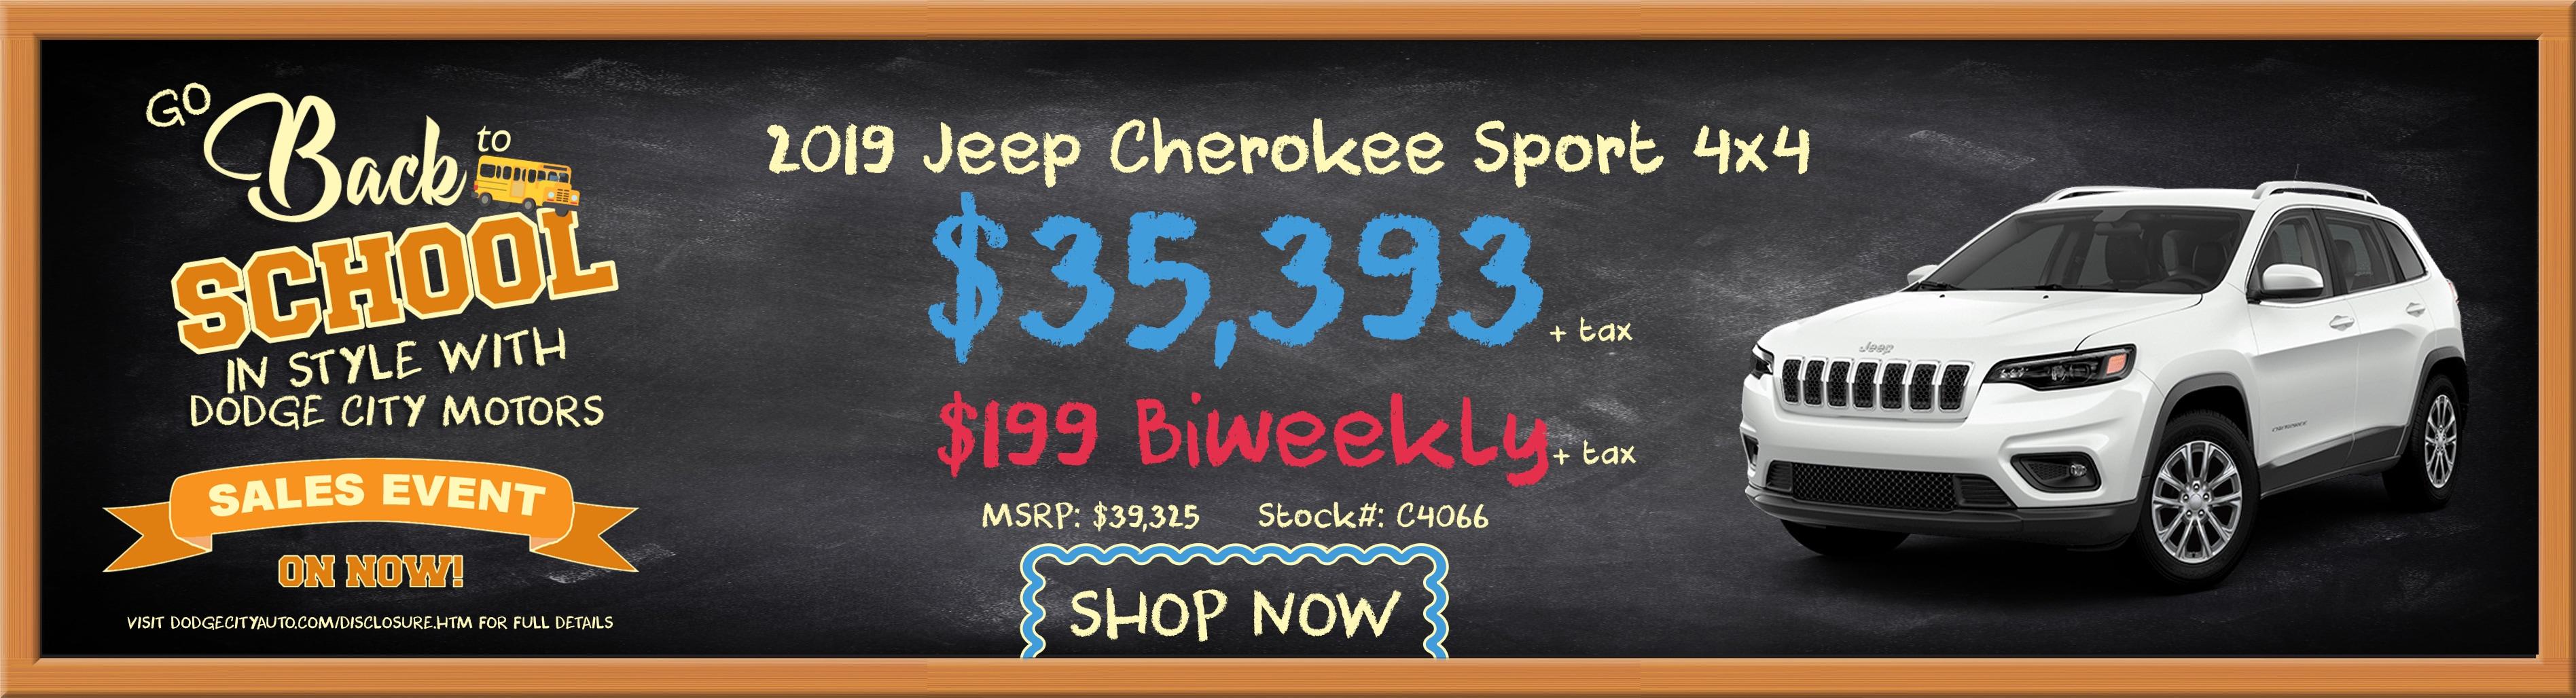 Dodge City Chrysler Dodge Jeep Ram | Saskatoon, SK | New